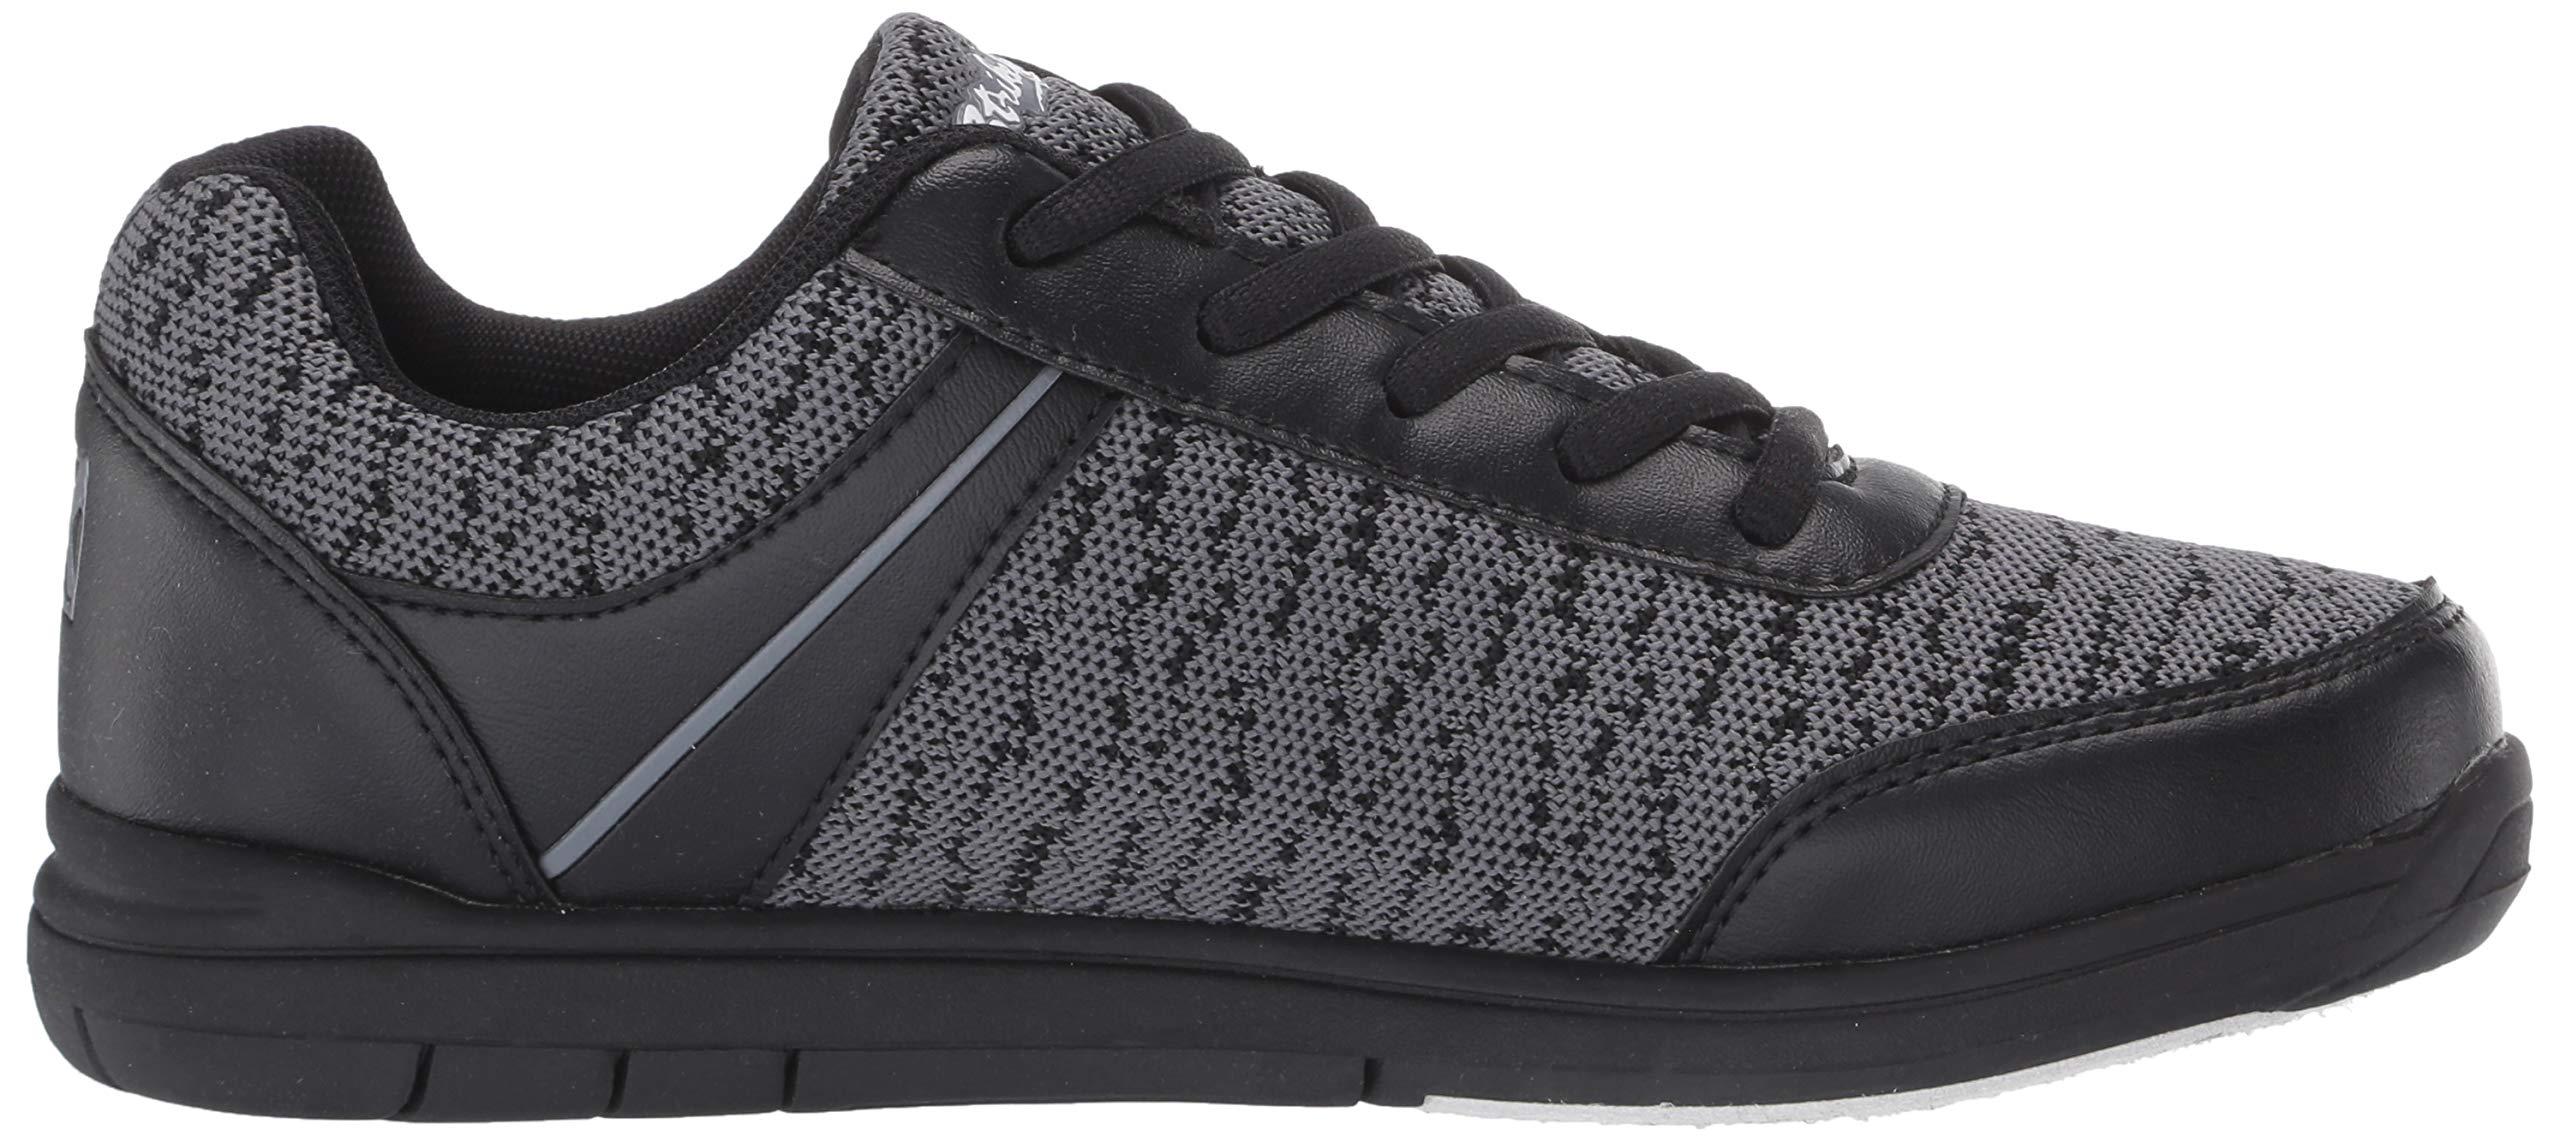 Strikeforce Flyer Black//Mag Blue Wide Width Bowling Shoes Mens Size 14 Strikeforce Bowling M-033-140